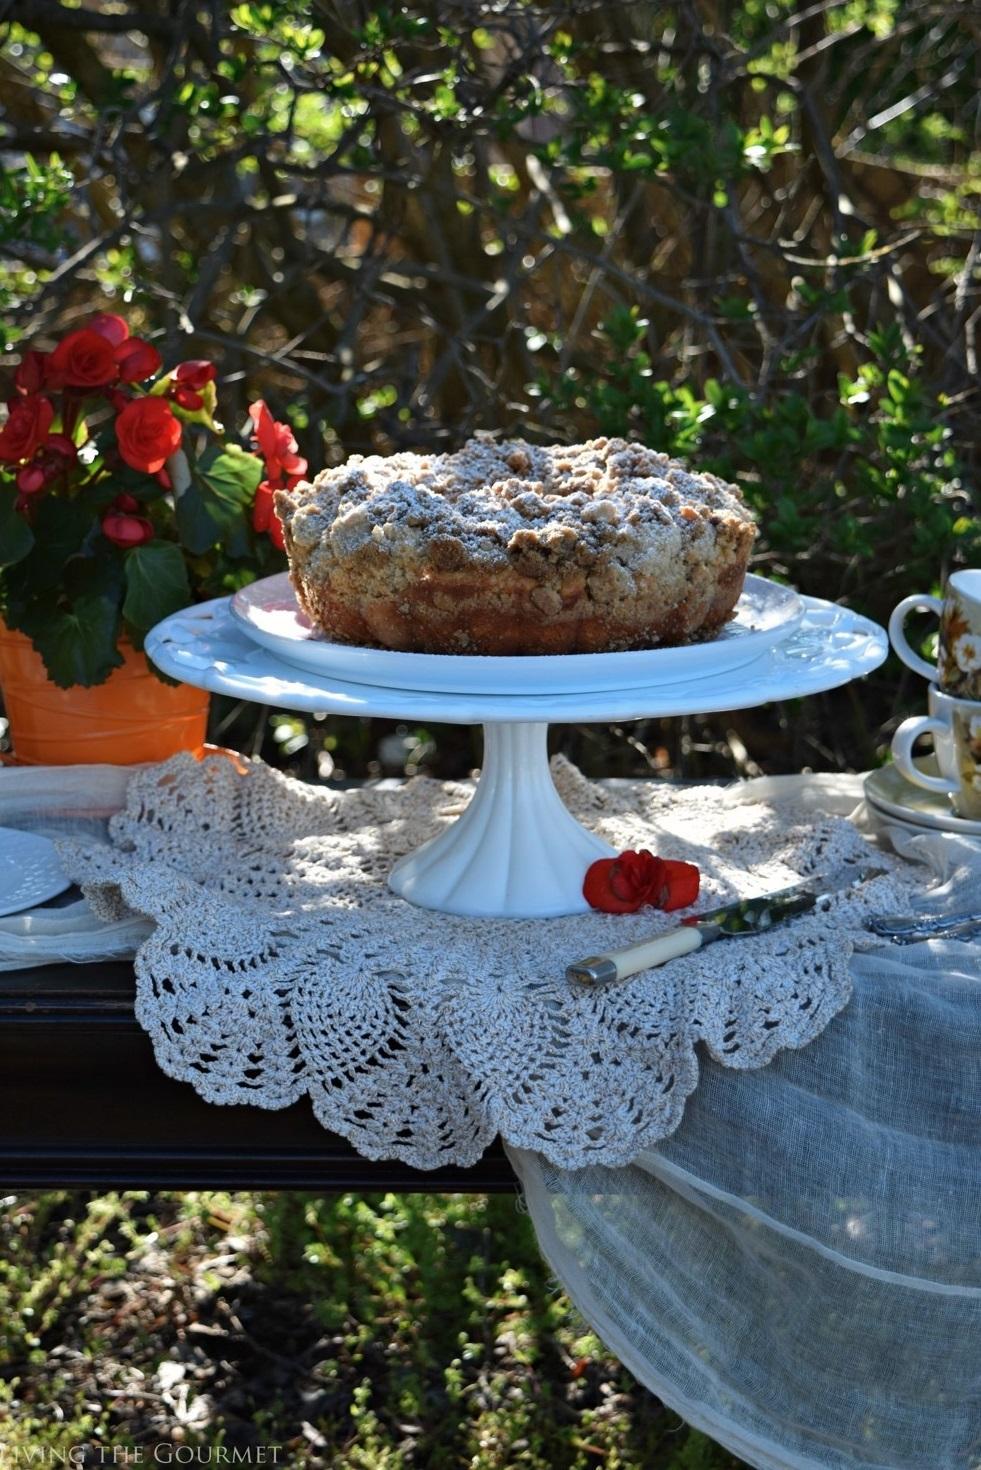 Living the Gourmet: New York Style Crumb Cake | #BundtBakers